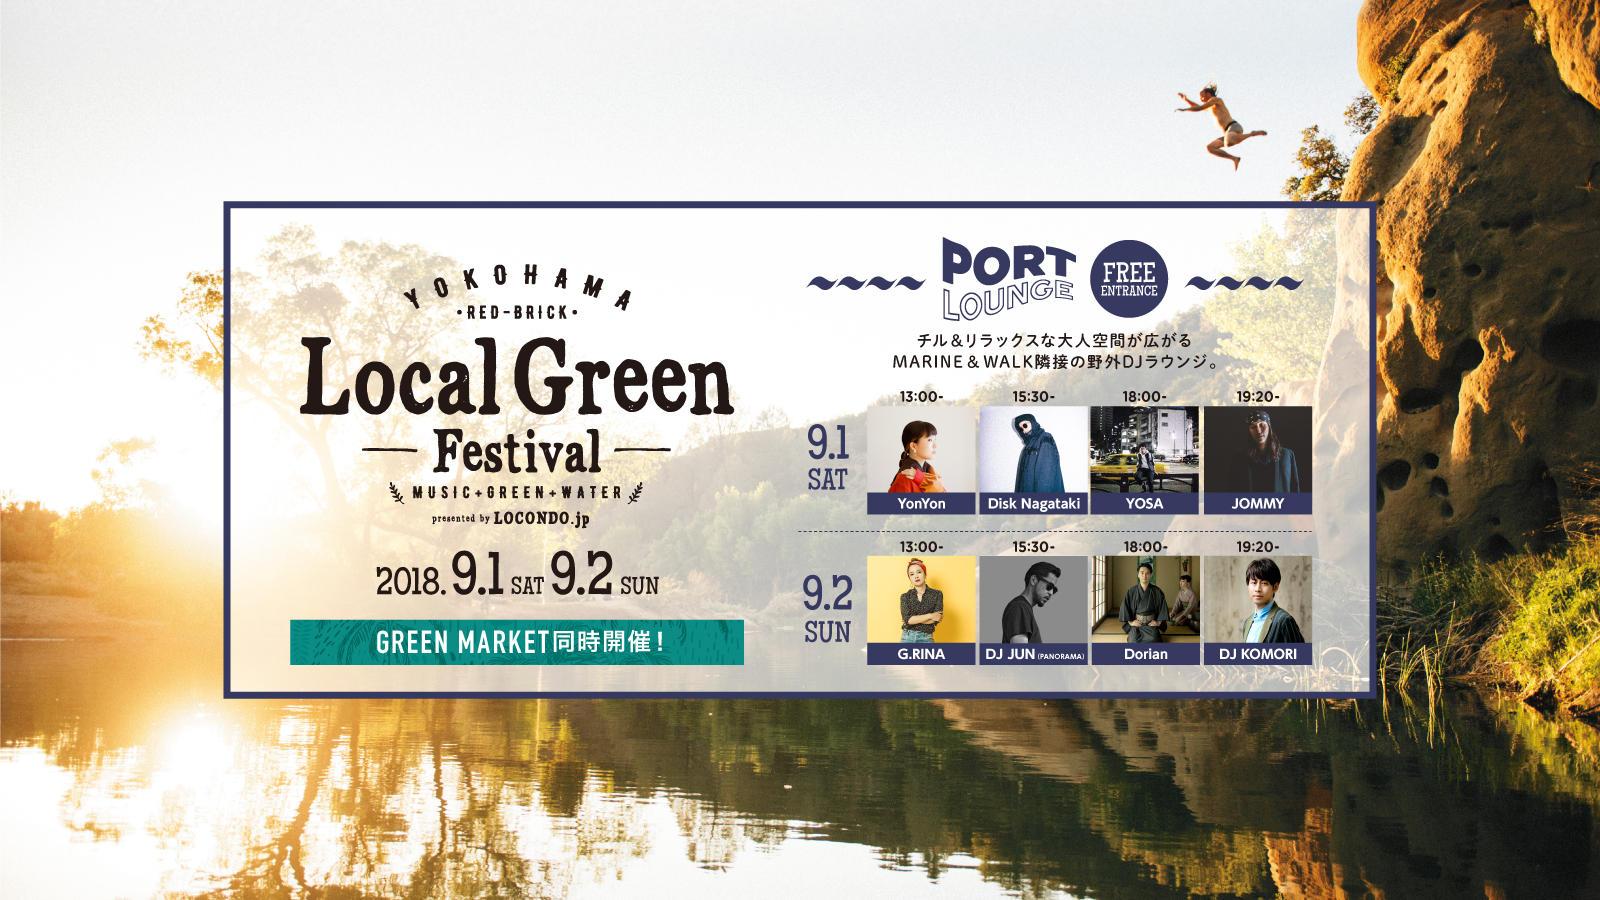 2018.9.1sat - 9.2sun 《LOCAL GREEN FESTIVAL》